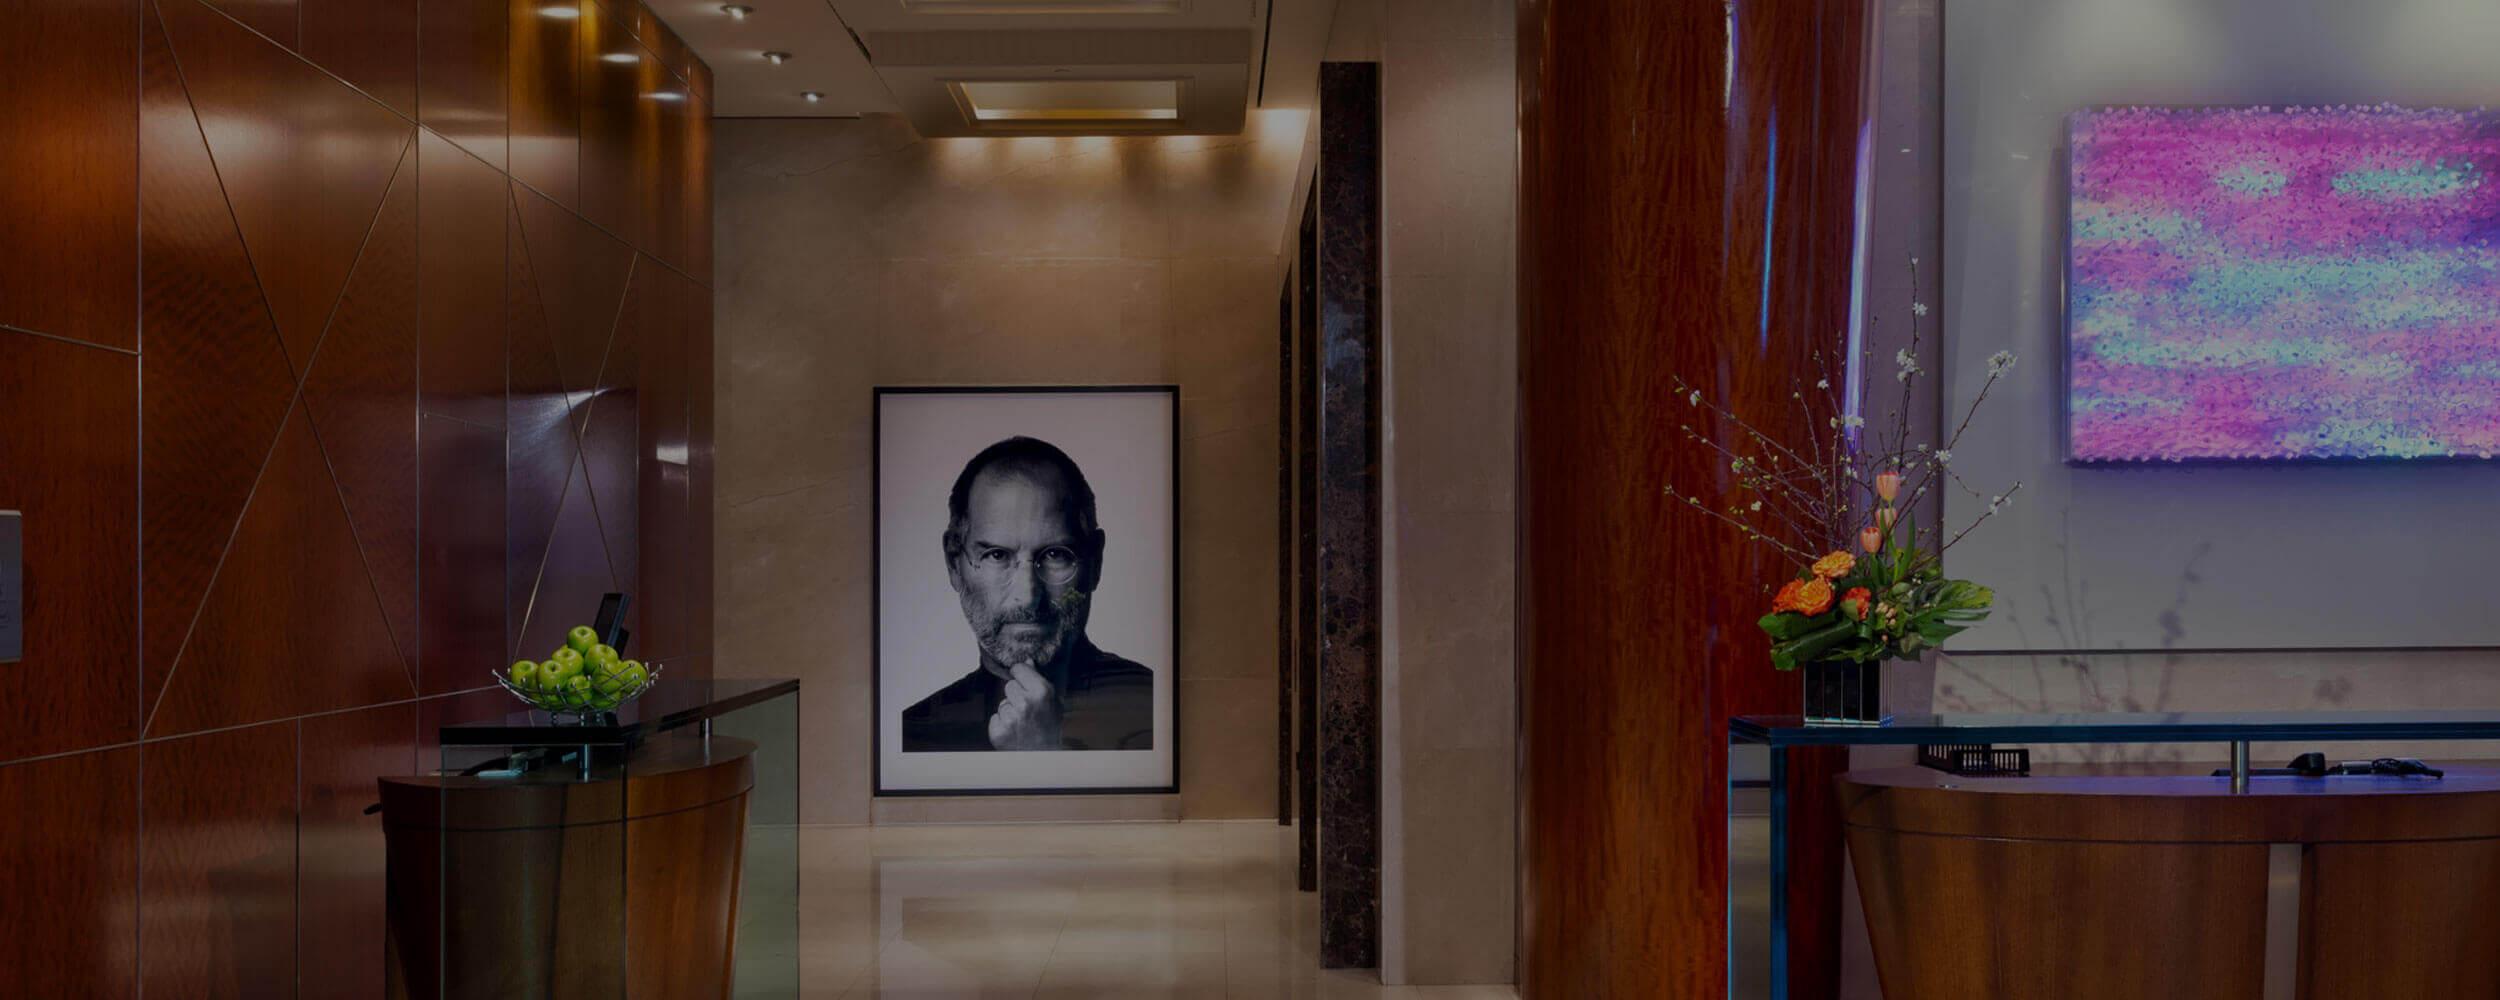 SoHo Hotel lobby with Steve Jobs artwork